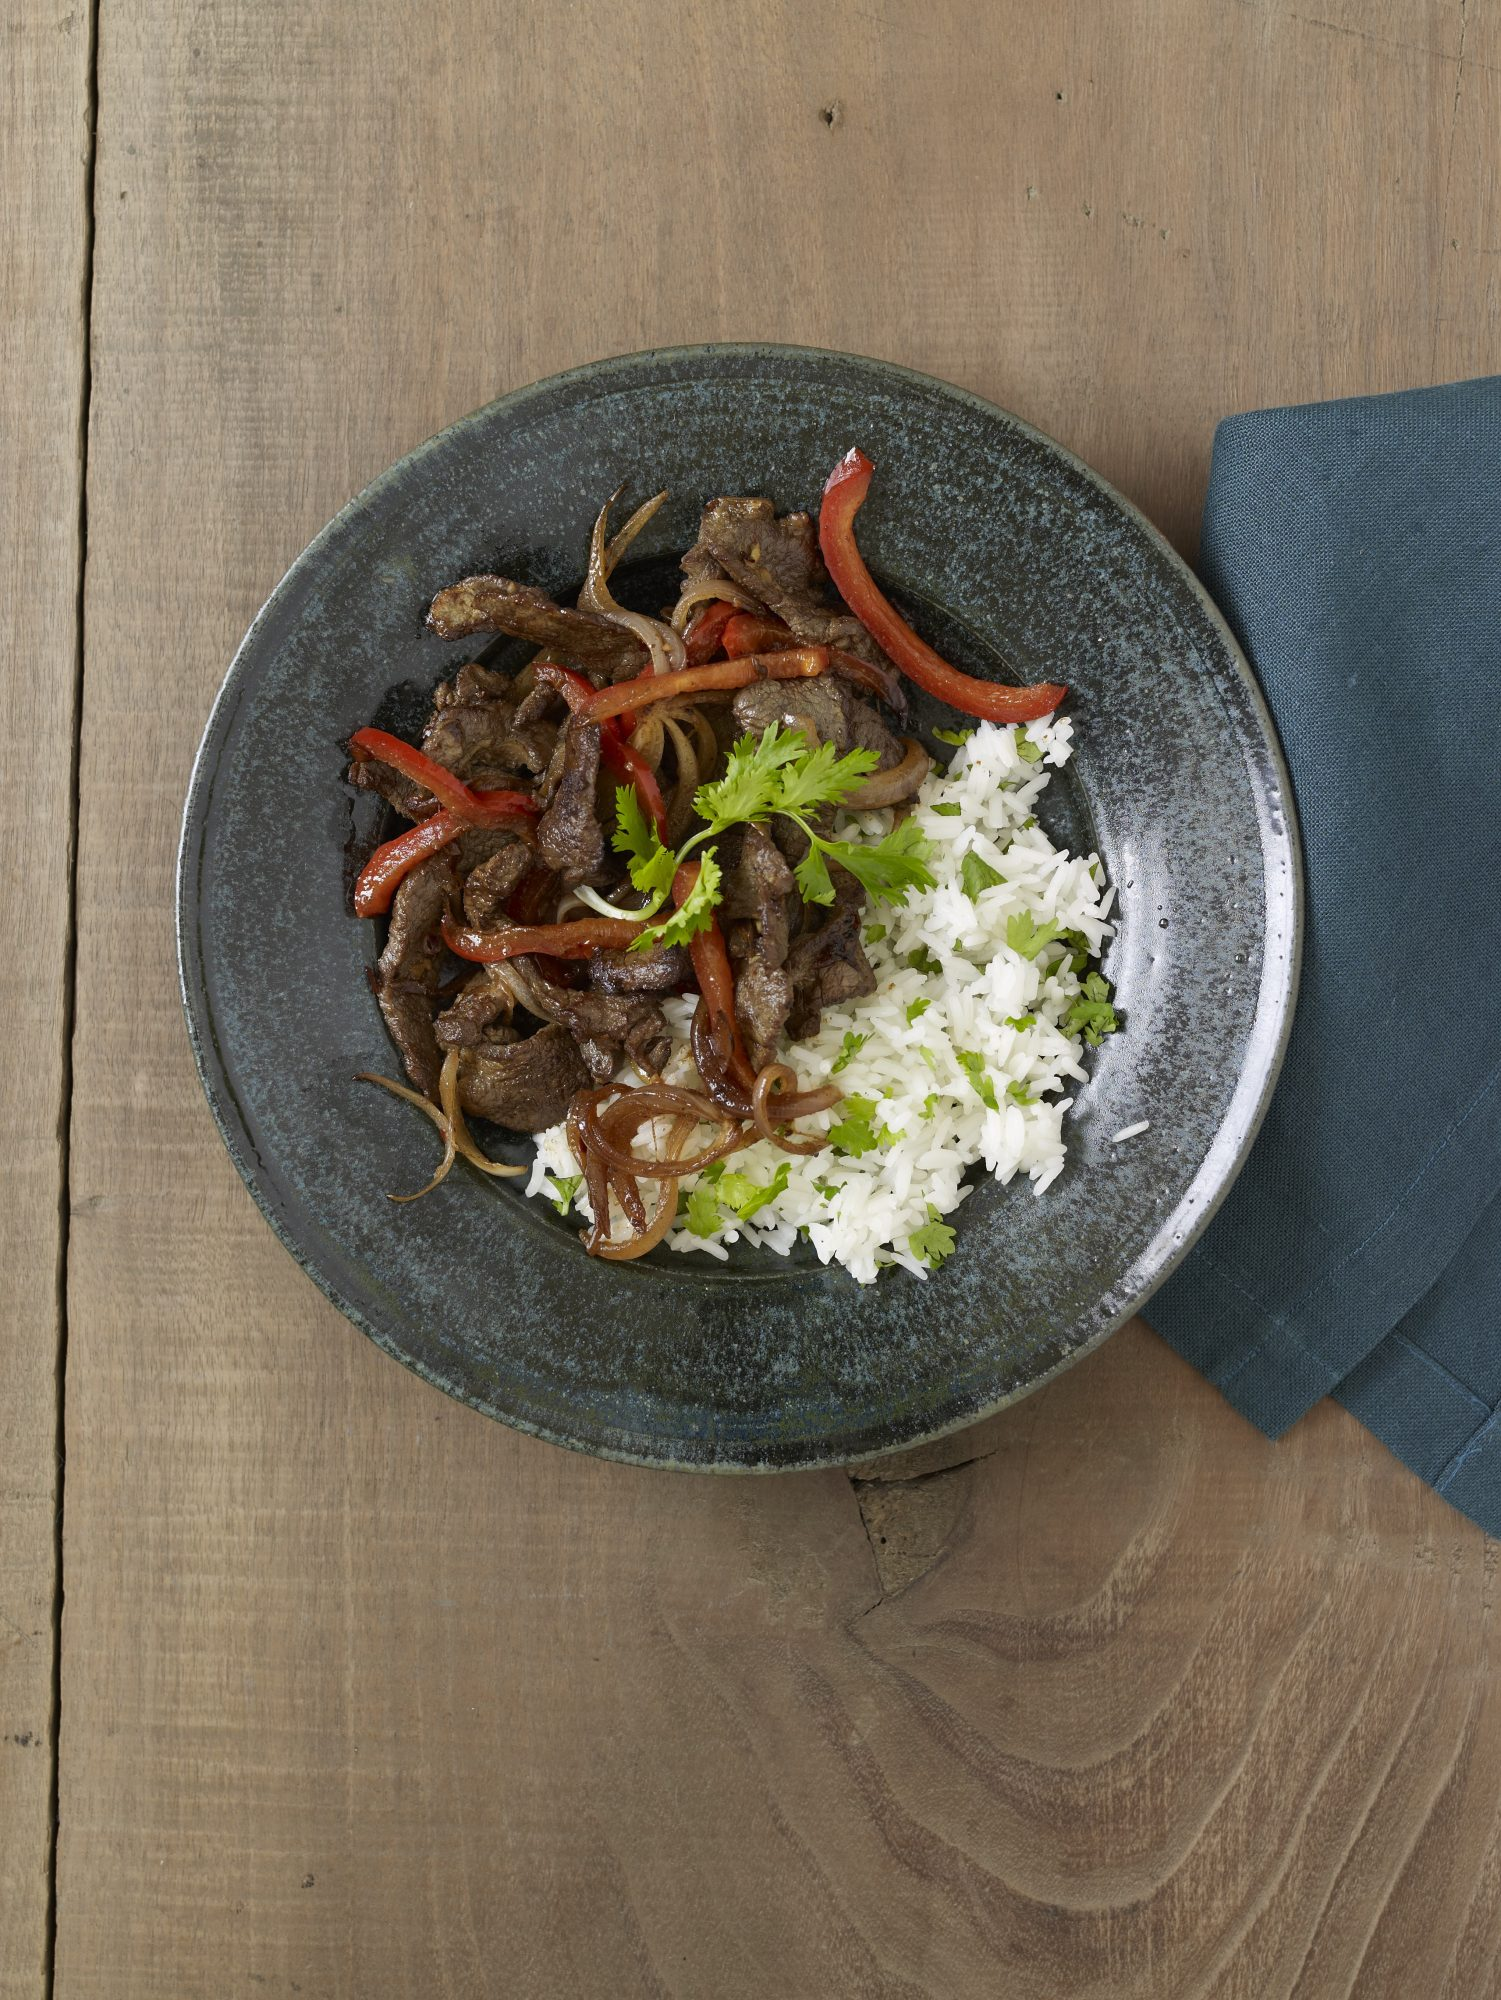 Spicy Stir-Fried Lamb with Cilantro Rice